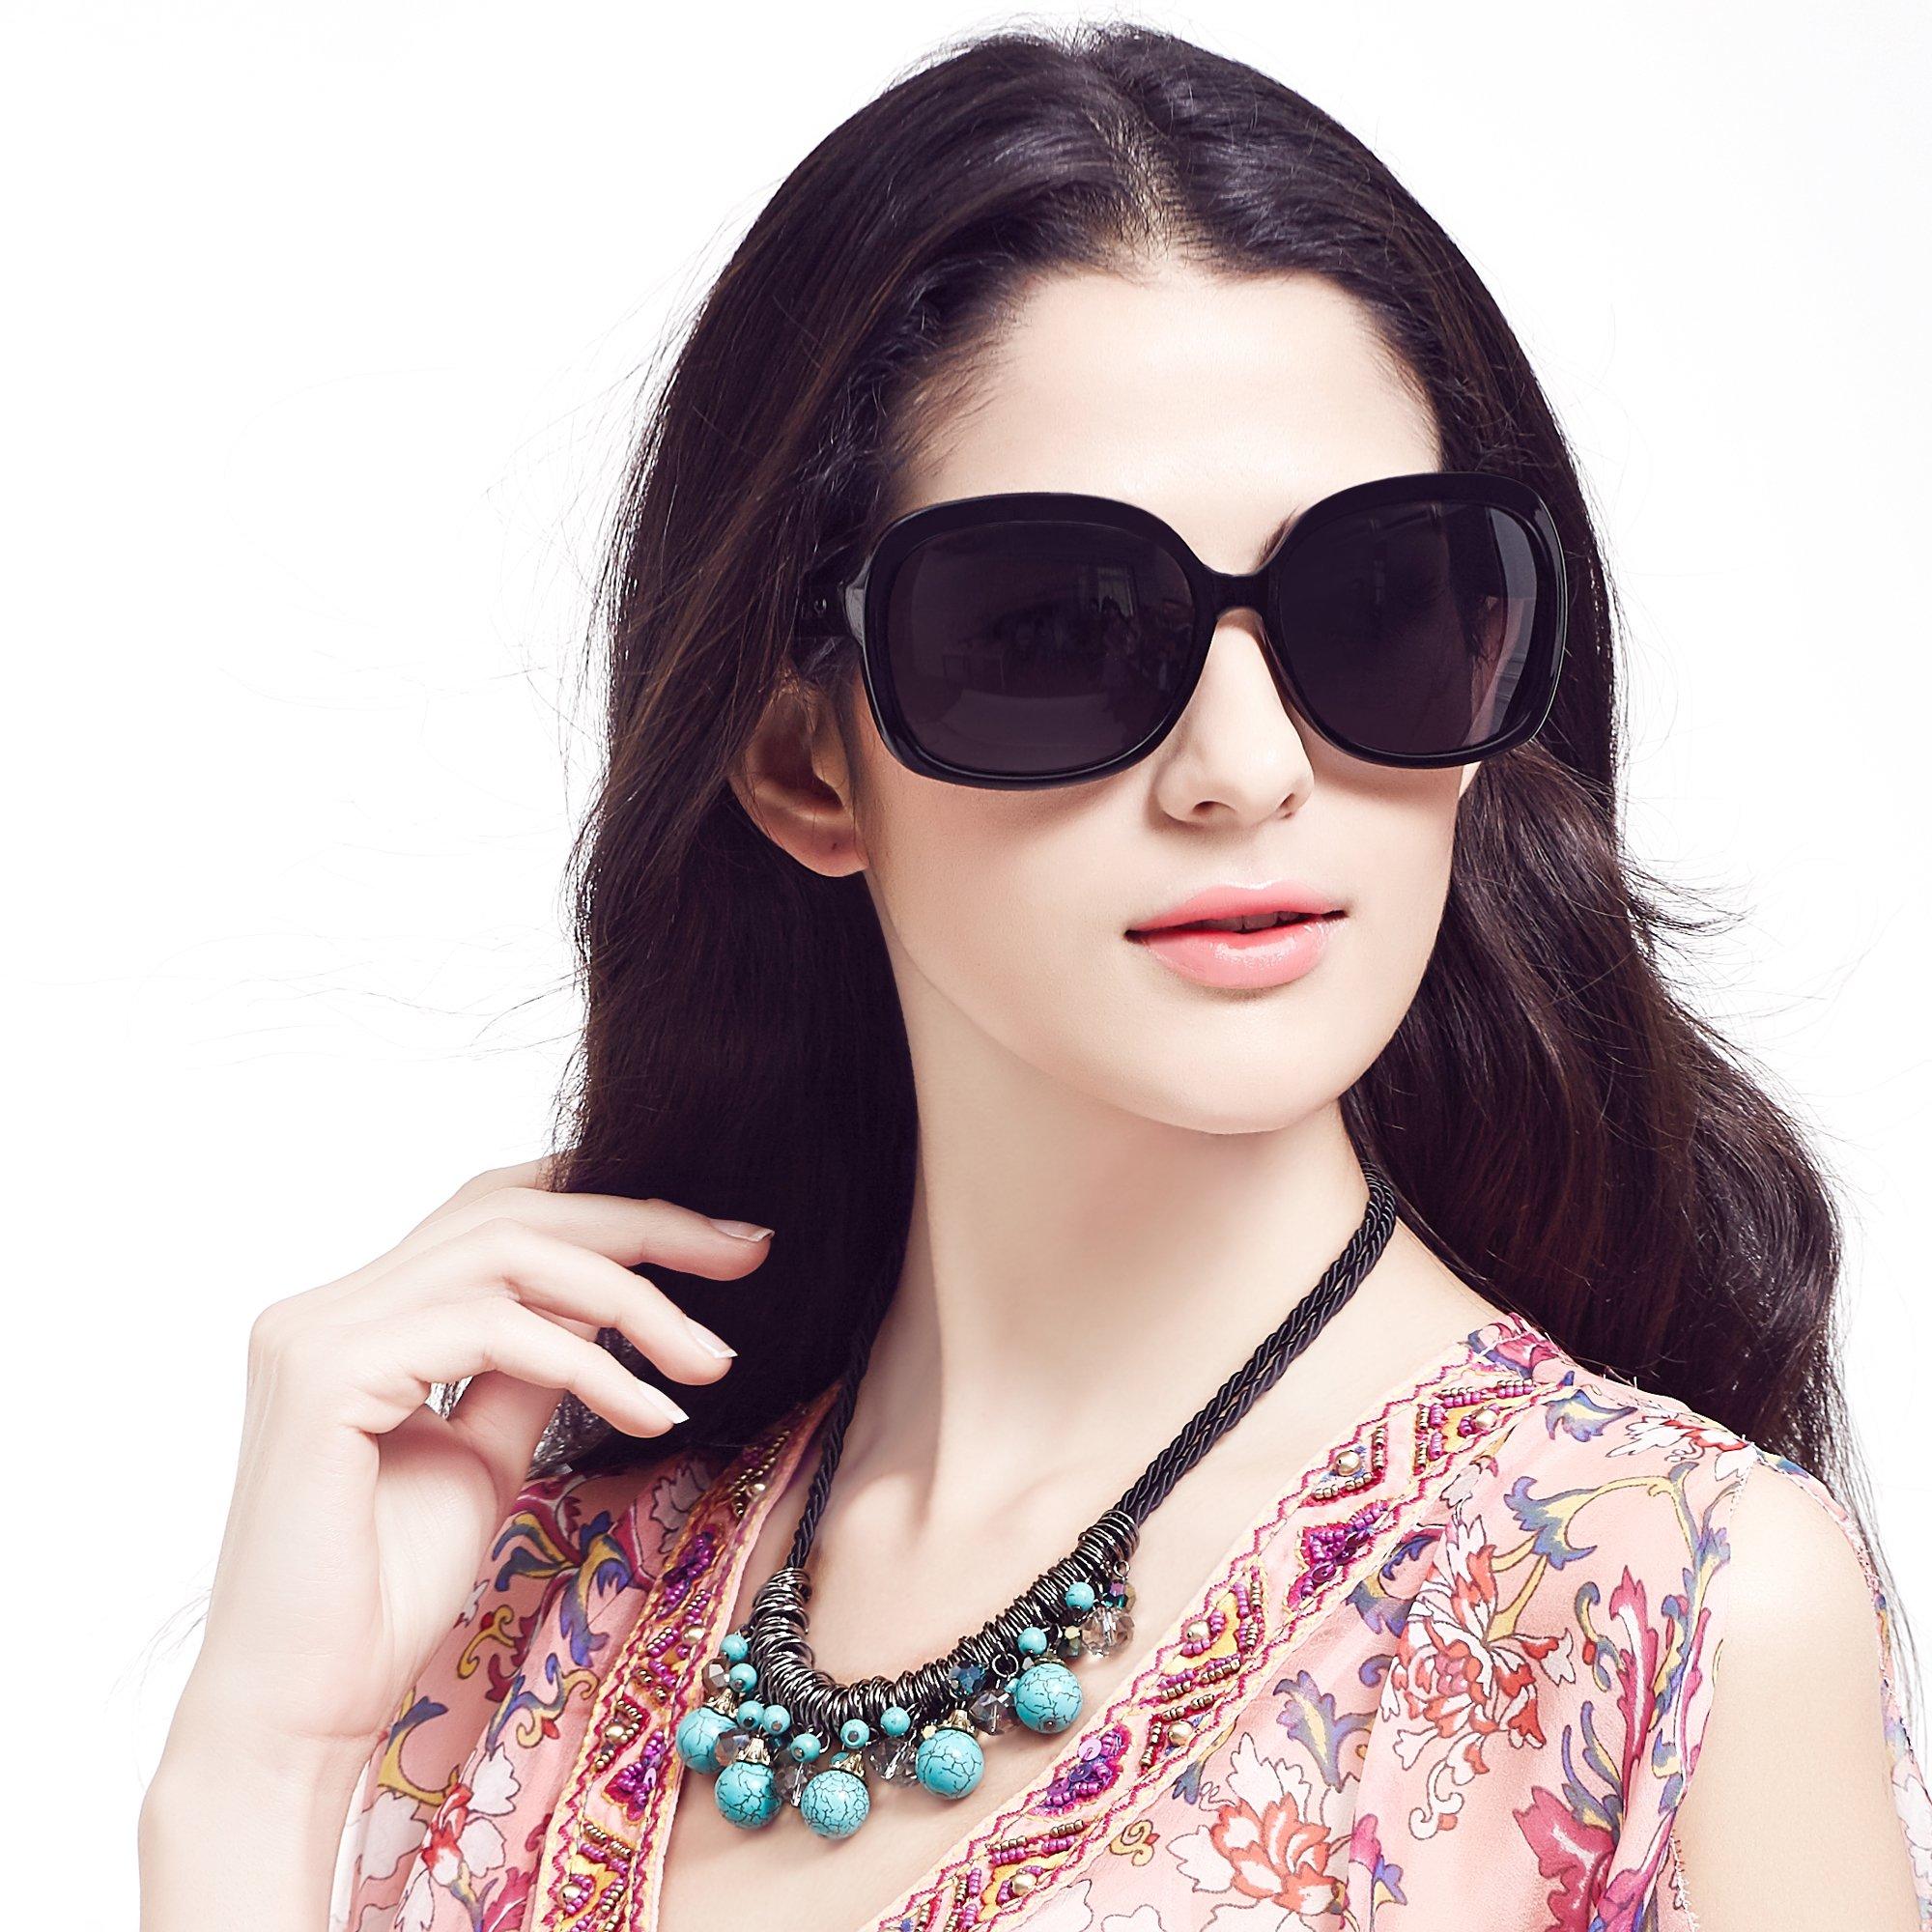 LianSan Oversized Womens Sunglasses Polarized uv Protection Simple Sunglasses LSP301 (polarized black) by LianSan